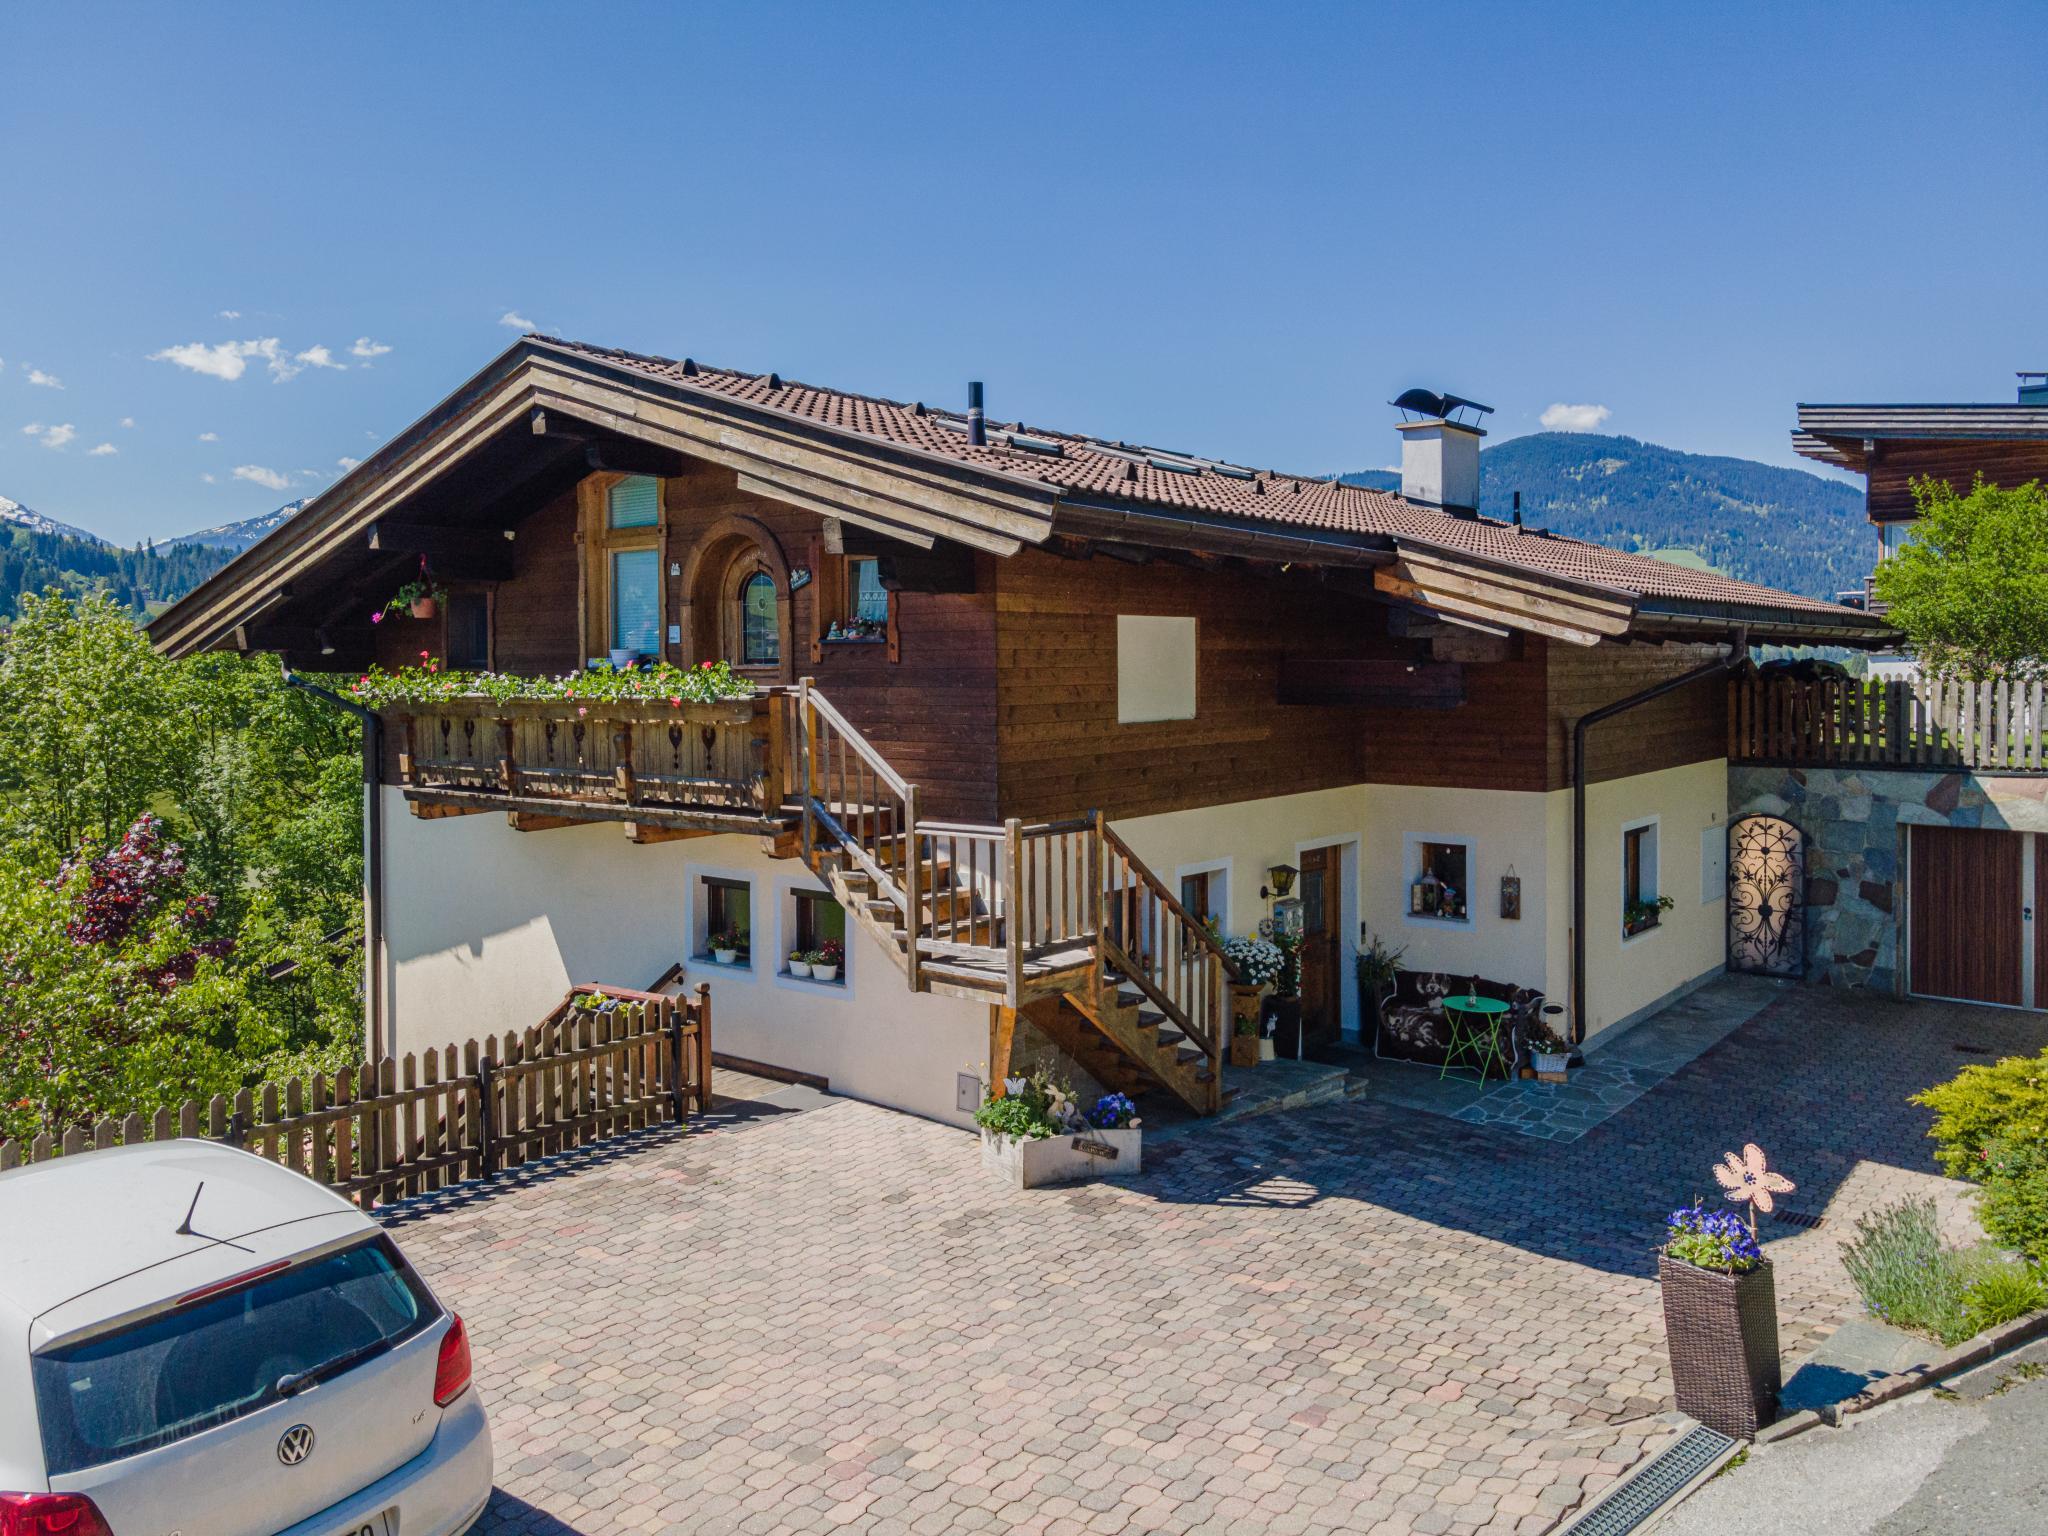 Haus Steger Tirol